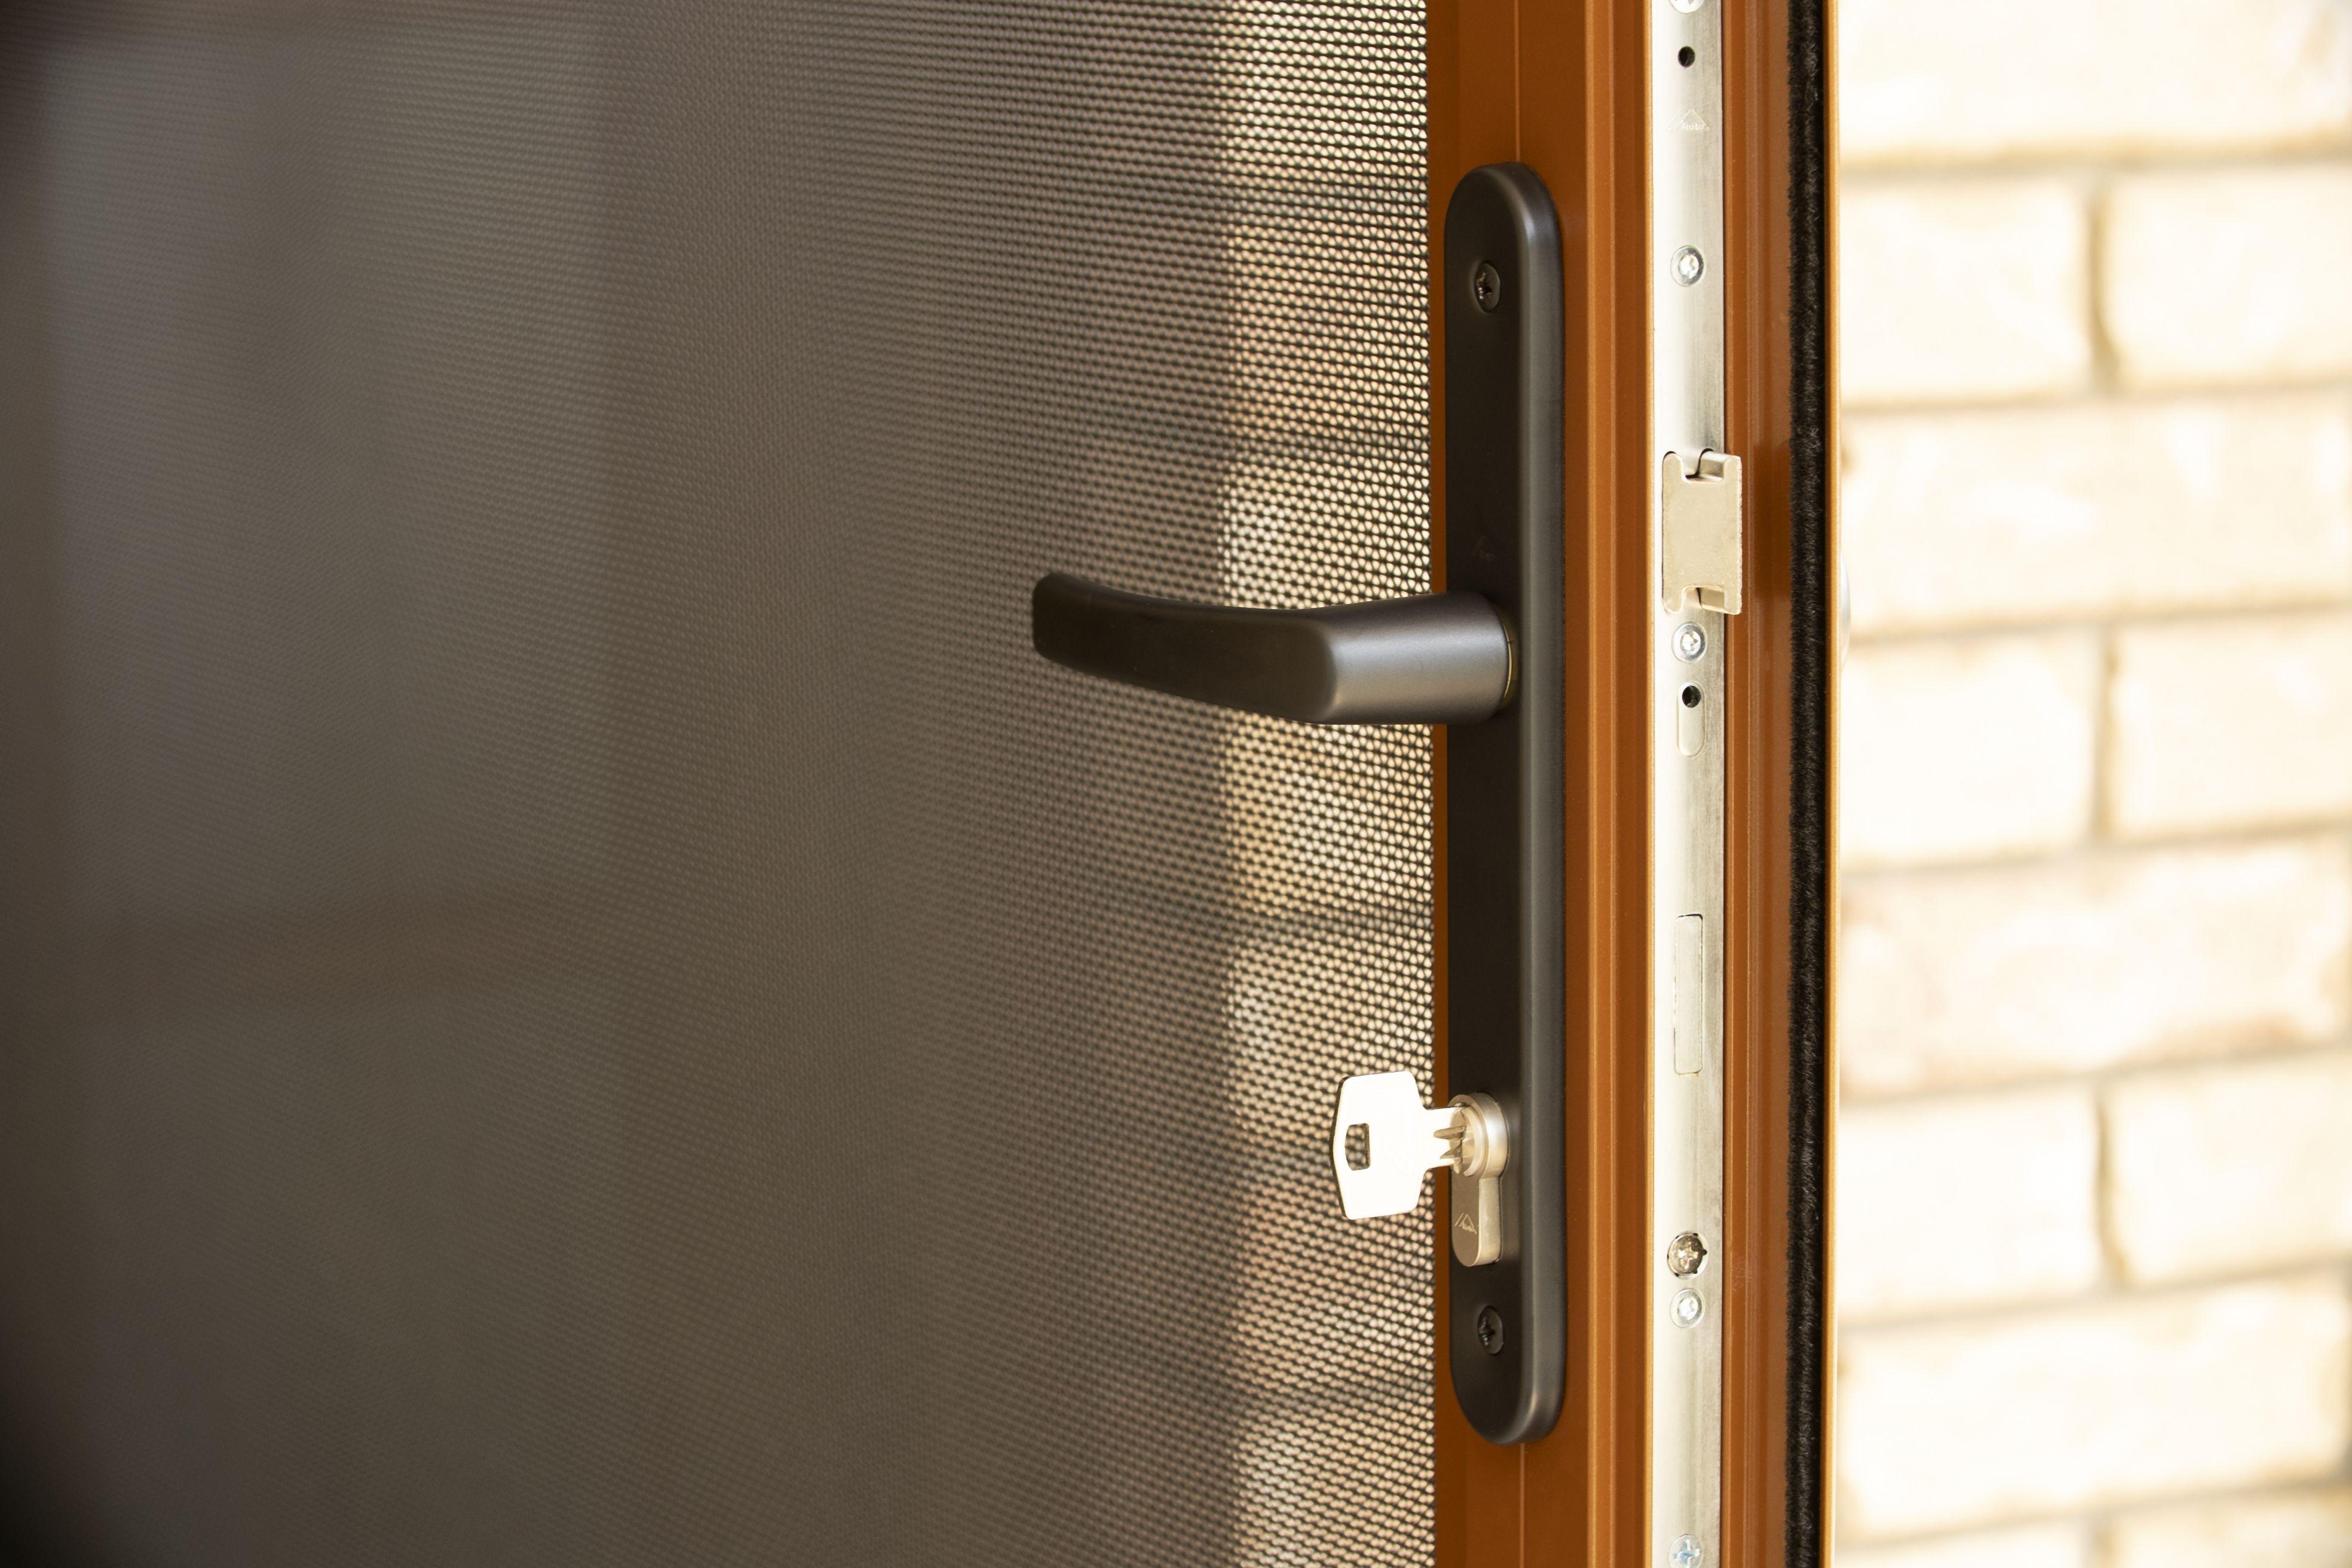 Pin On Crimsafe Iq The Toughest Security Door In Australia